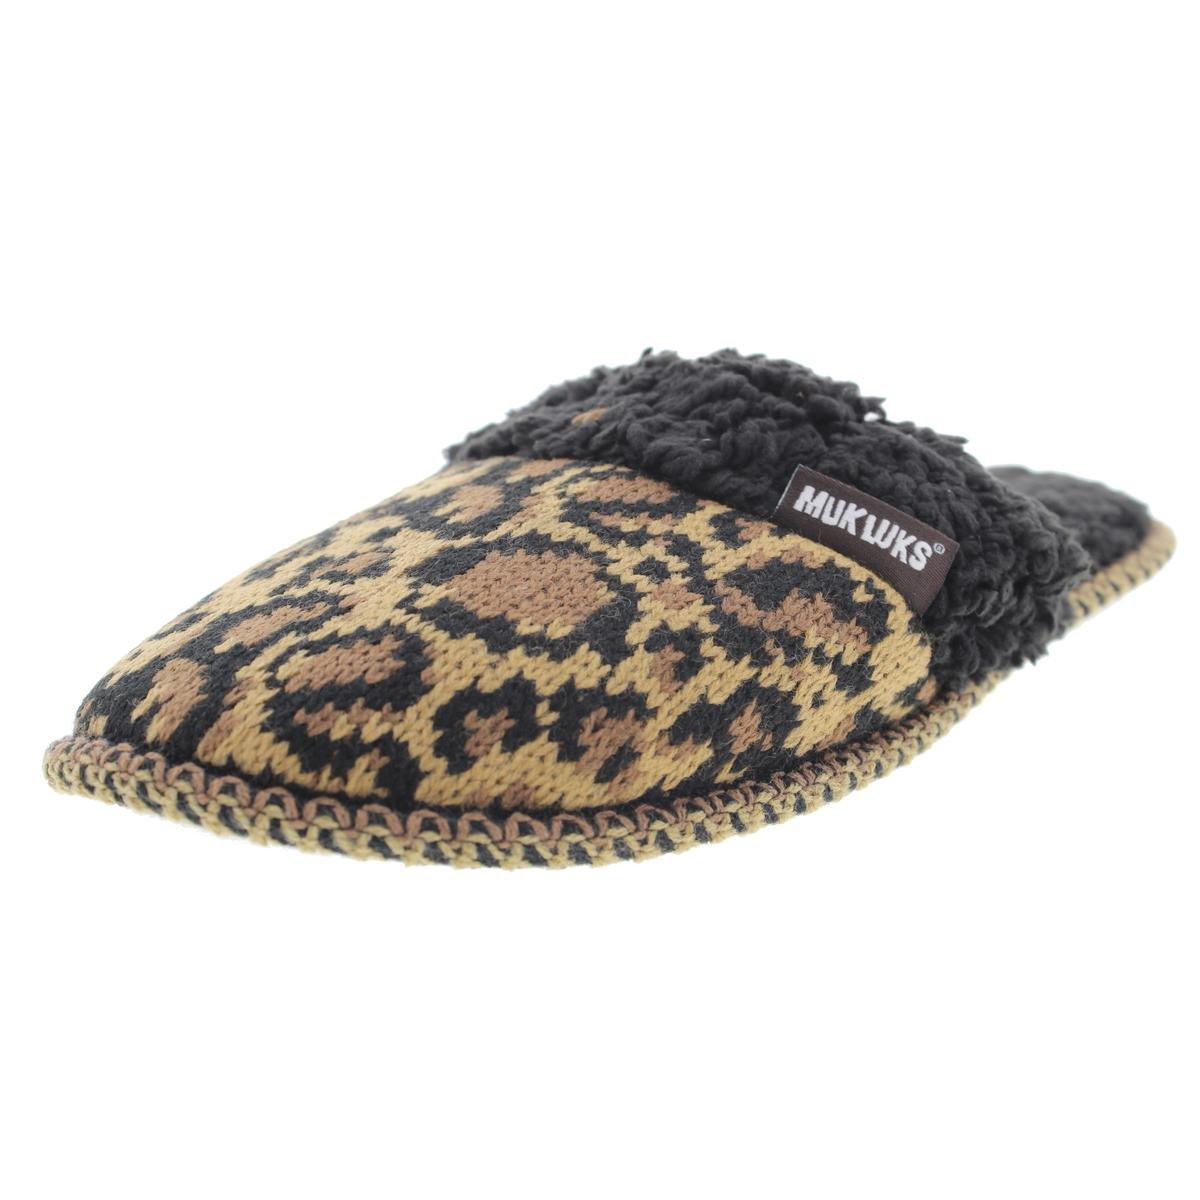 MUK LUKS Women's Fairisle Knit Scuff-Leopard Medium/7-8 M US